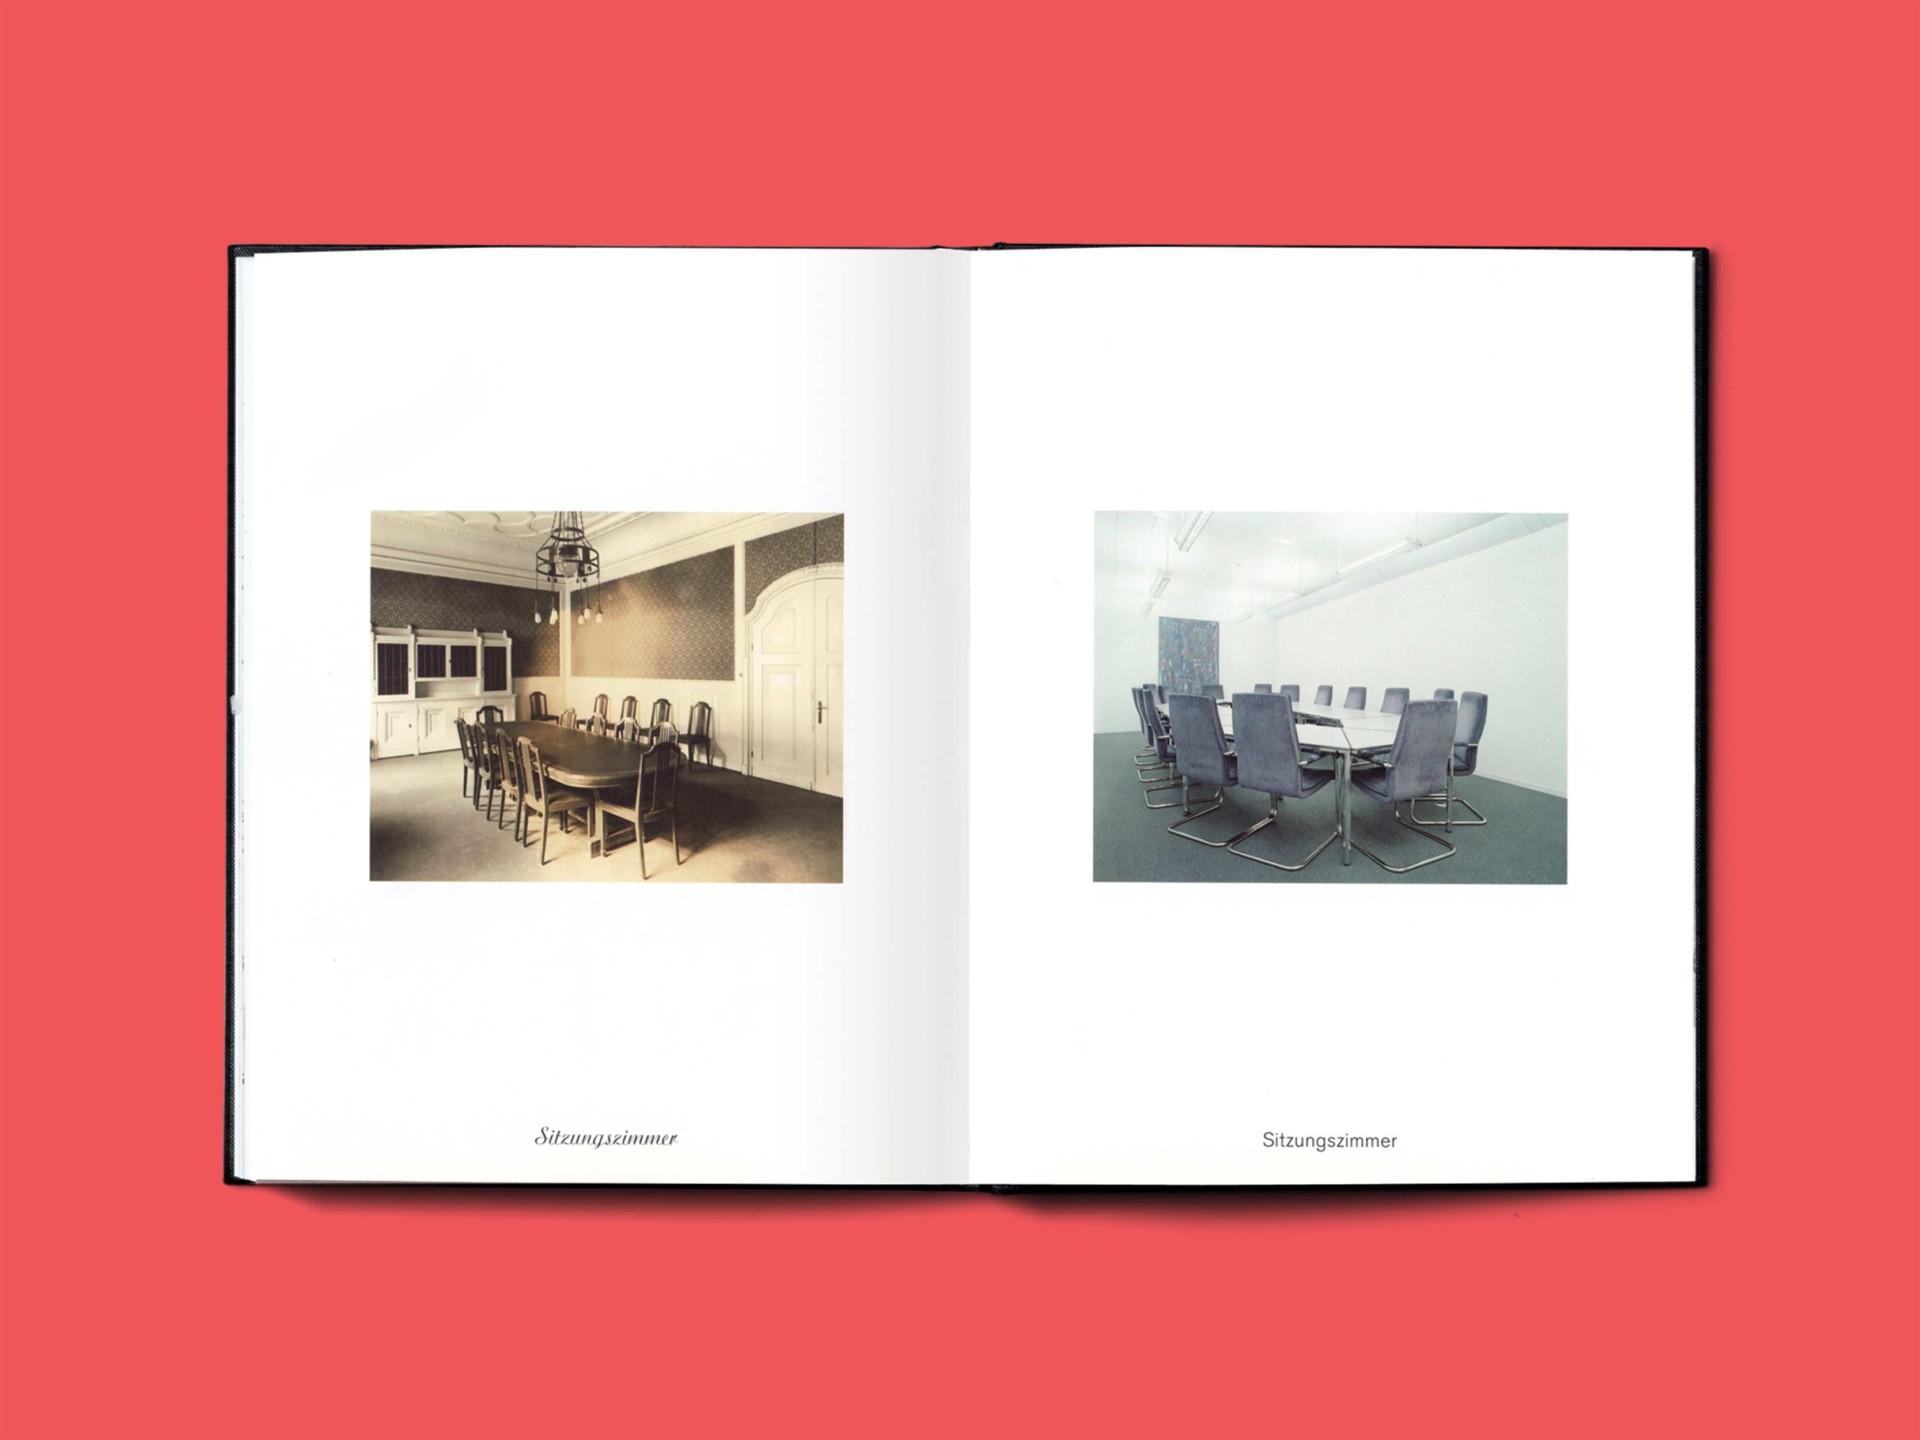 BKVK 1905 2005 — Buchgestaltung